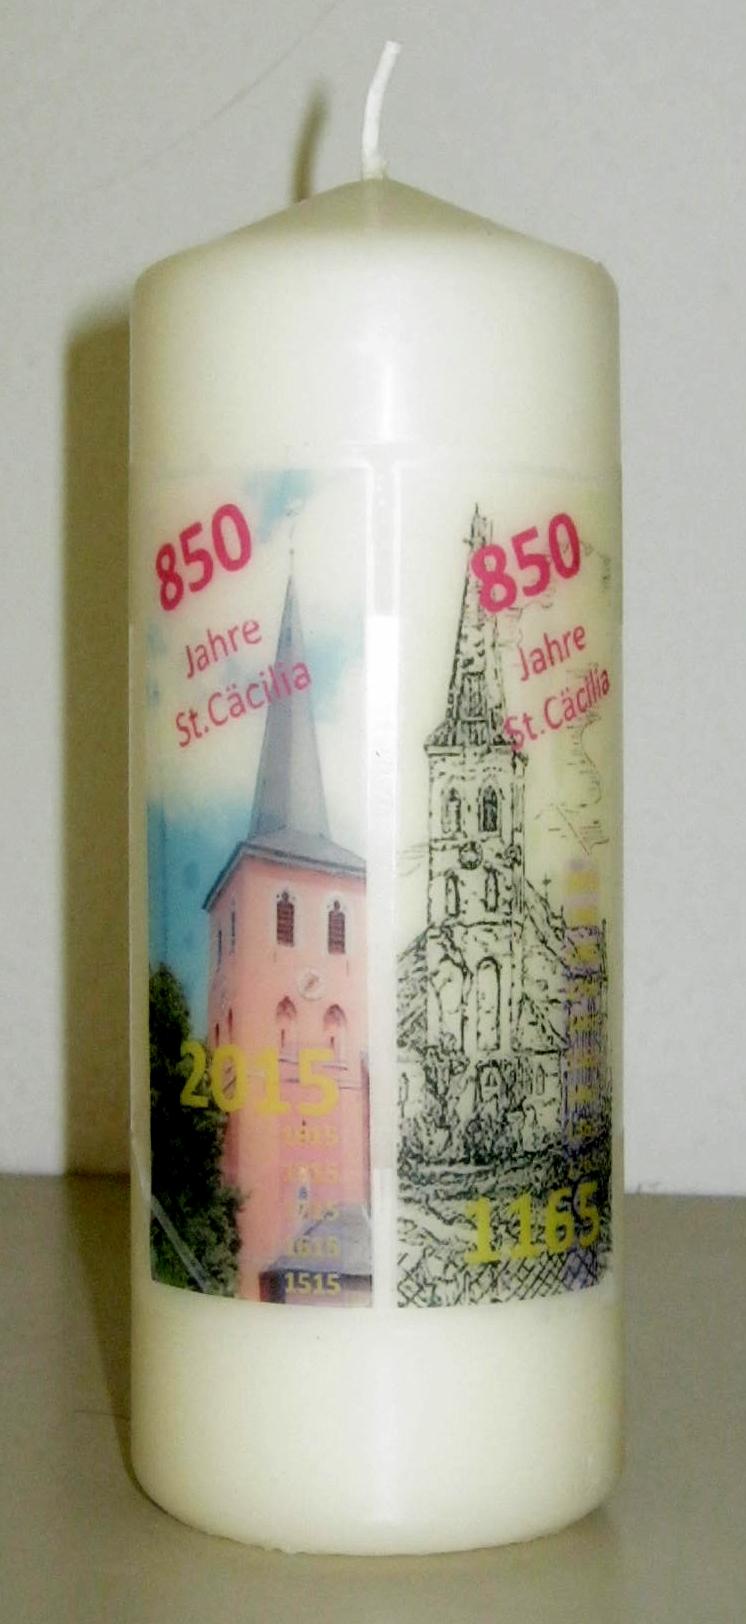 Andenken-Kerze zum 850-jährigen Kirchenjubiläum